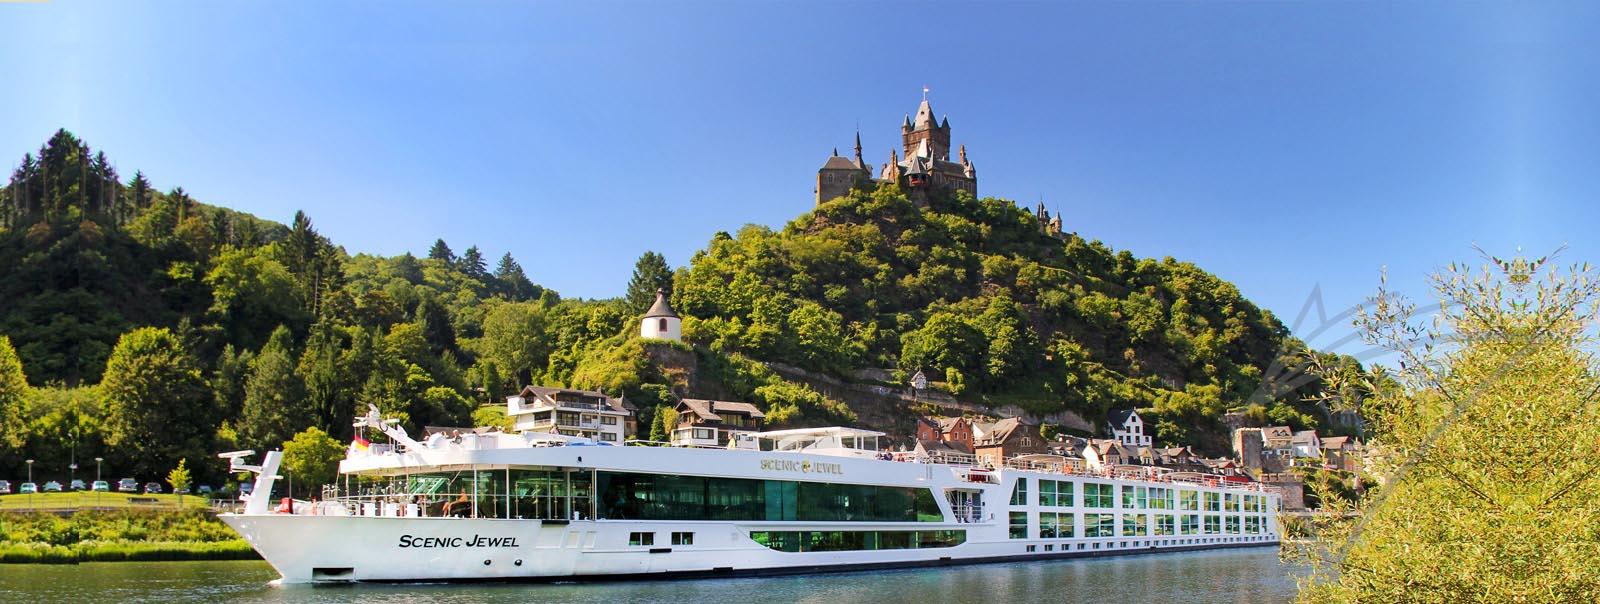 Scenic-cruise